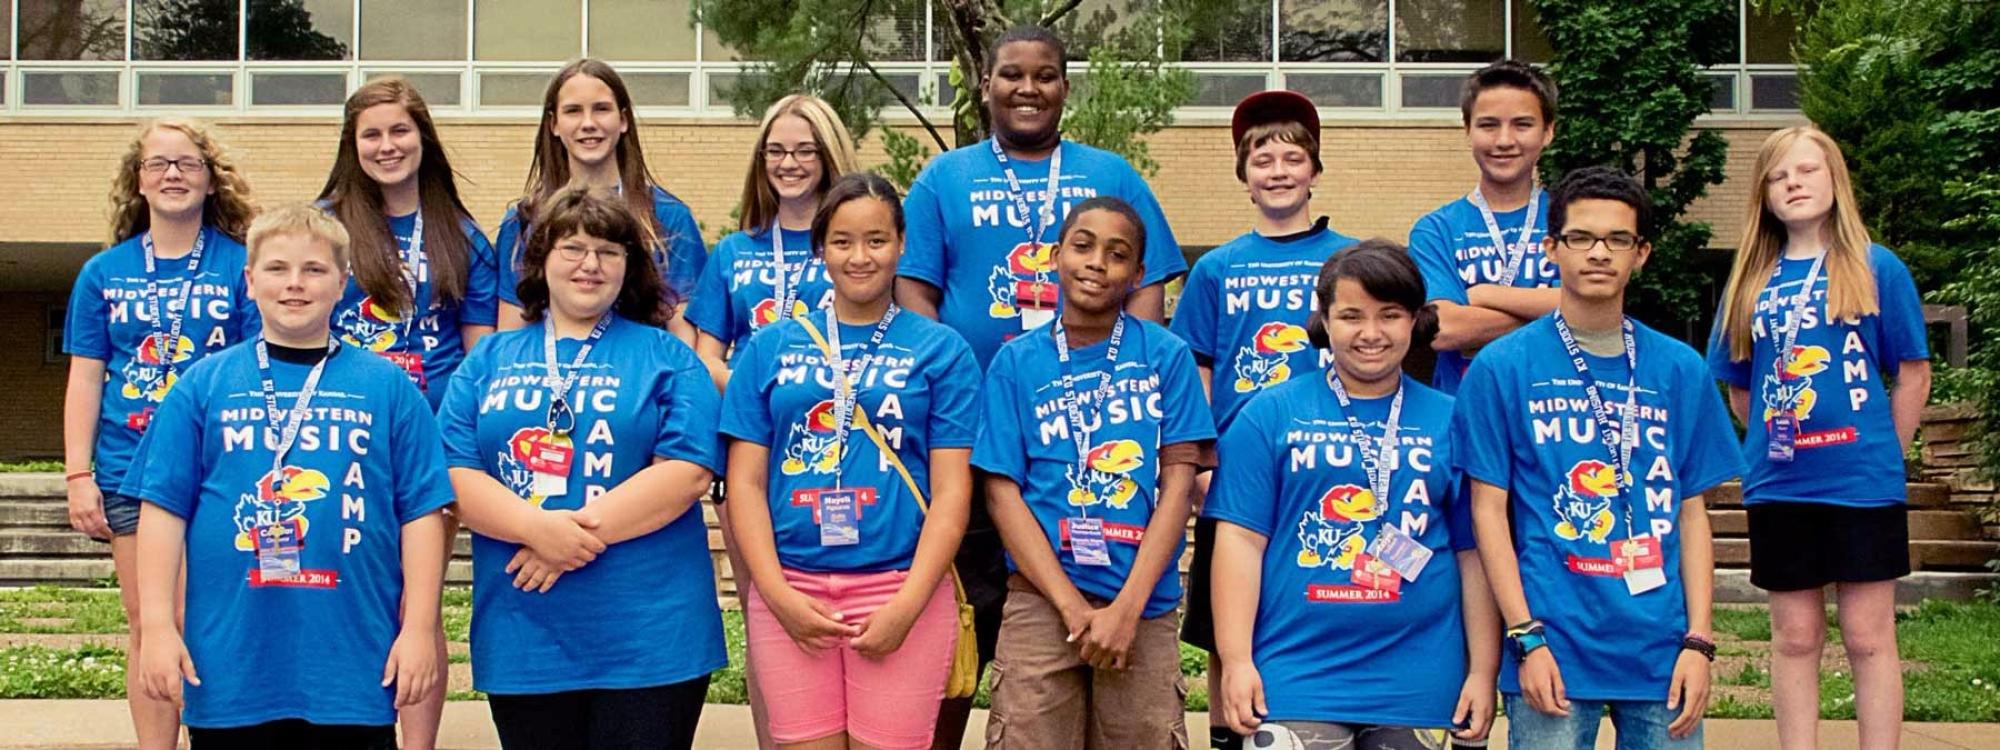 2014 Band of Angels Summer Band Camp Scholarship Recipients